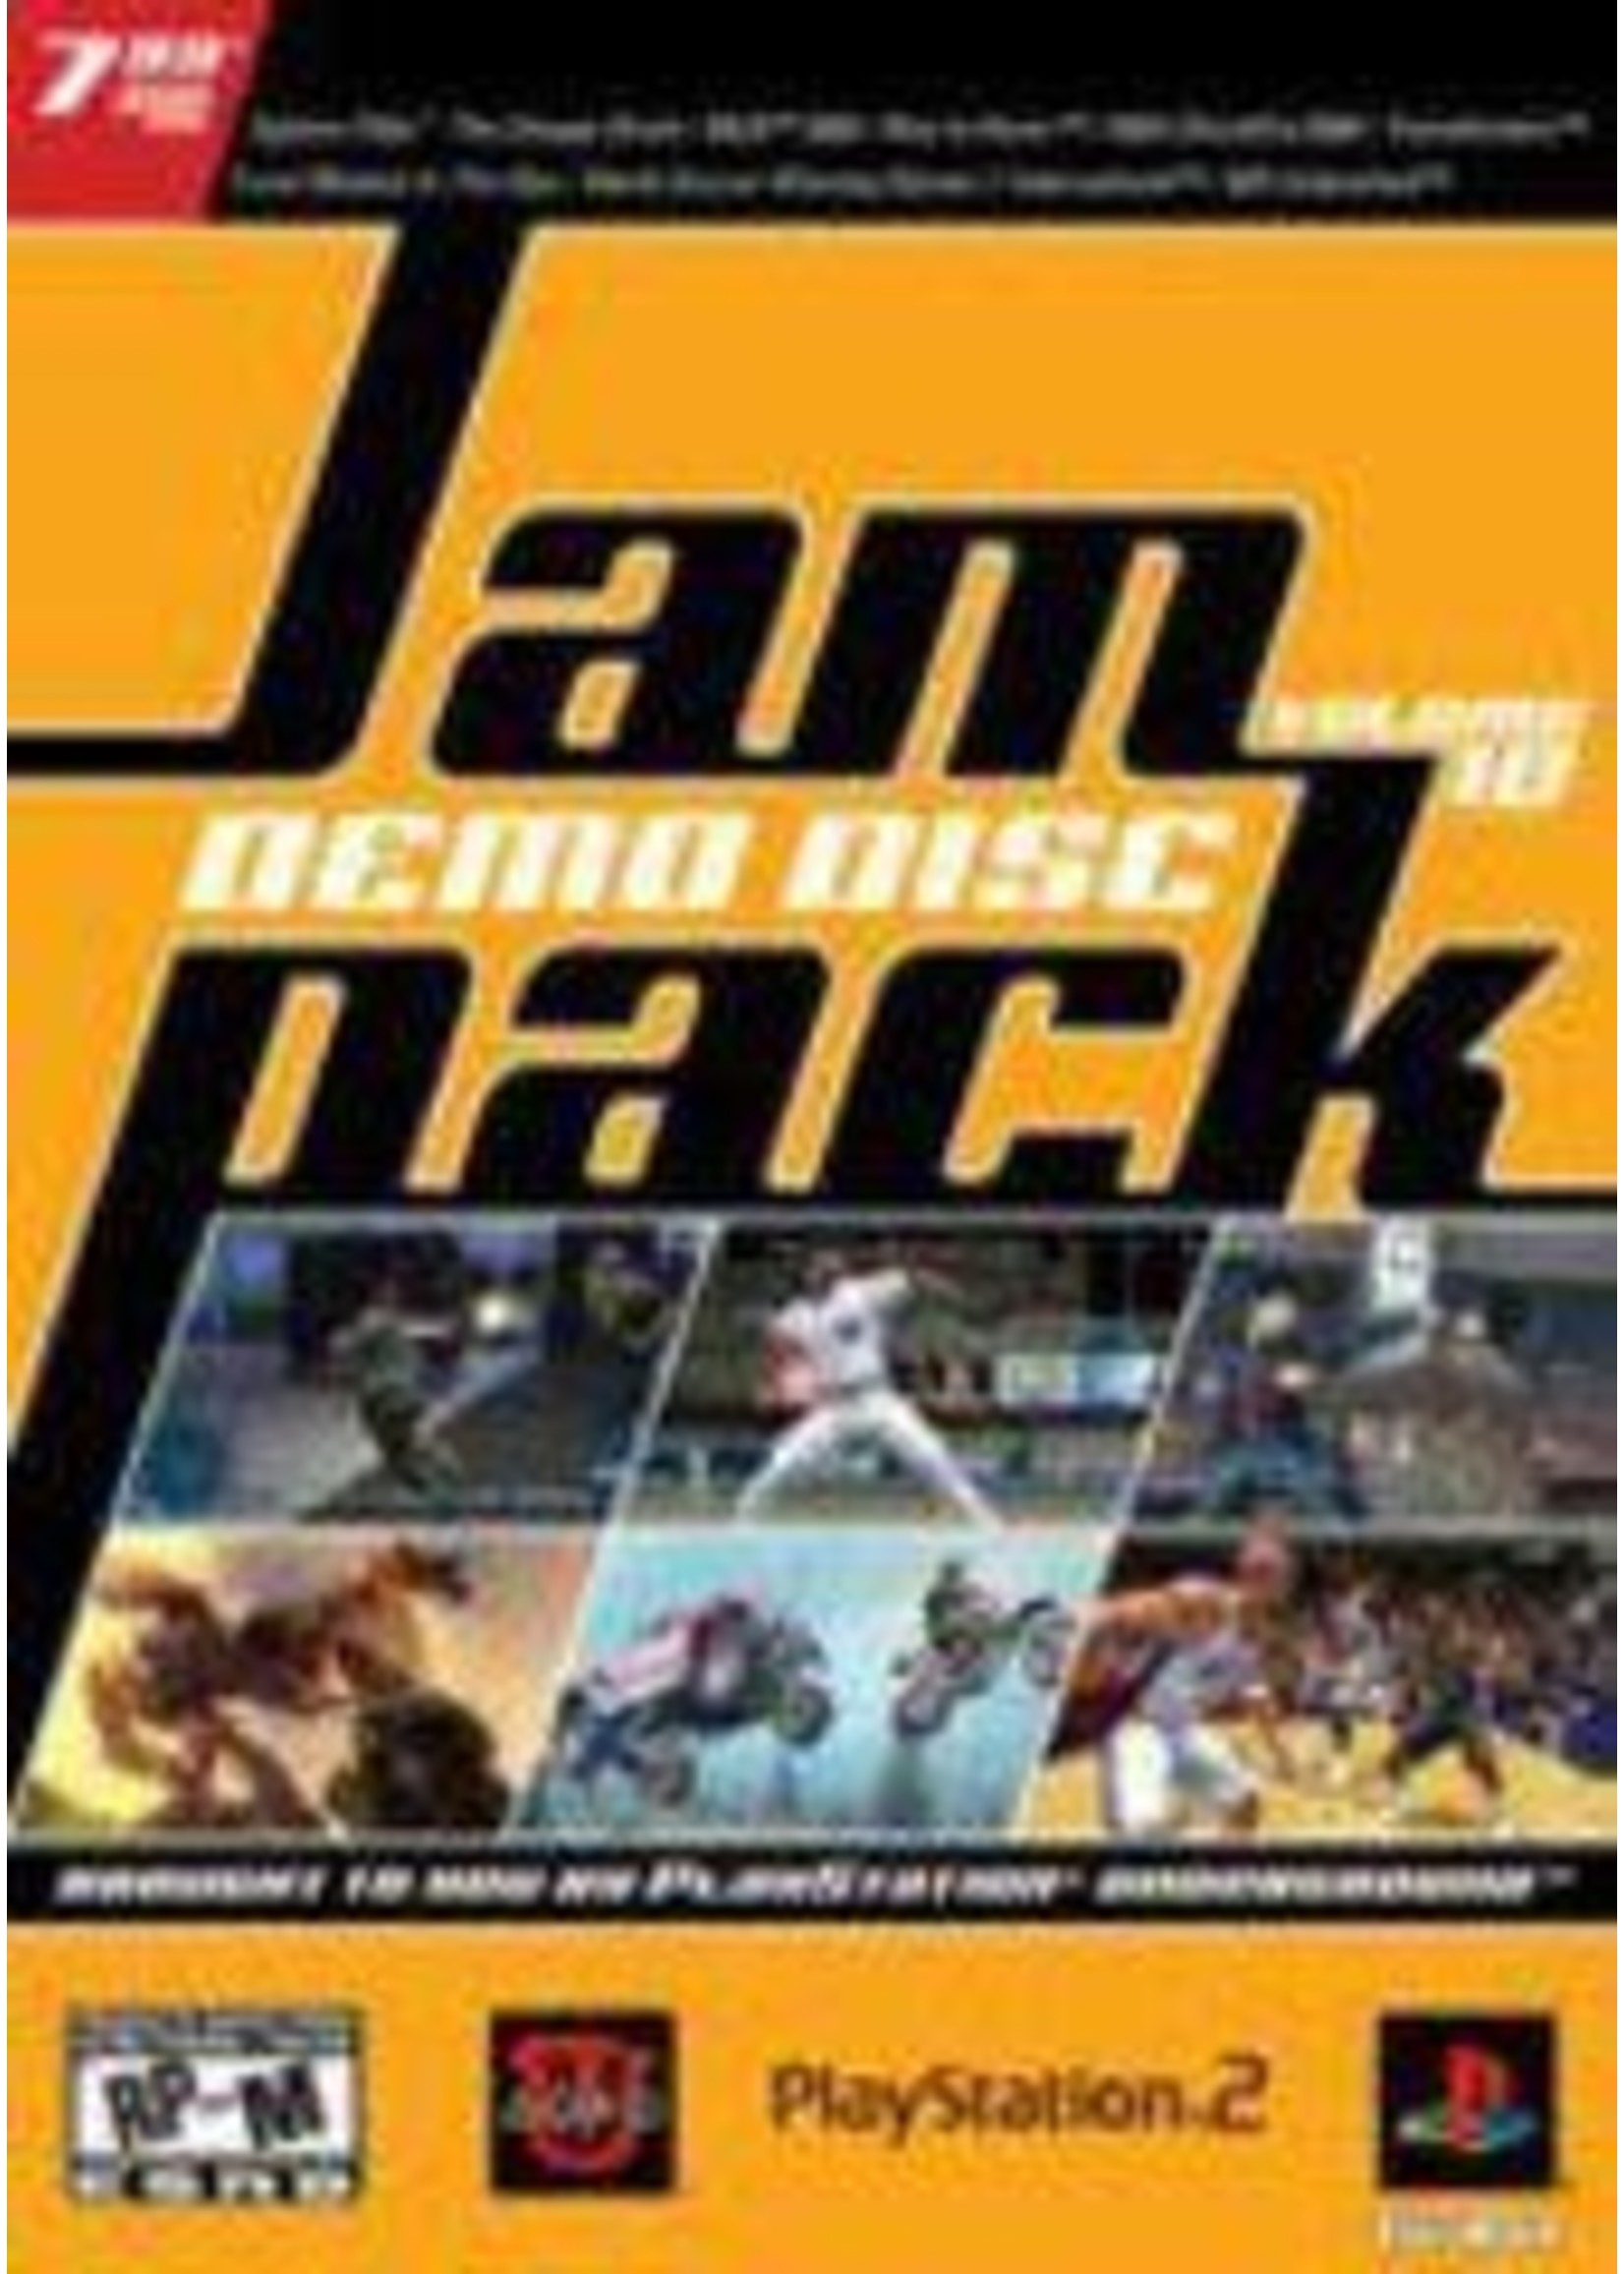 PlayStation Underground Jampack Vol. 10 Playstation 2